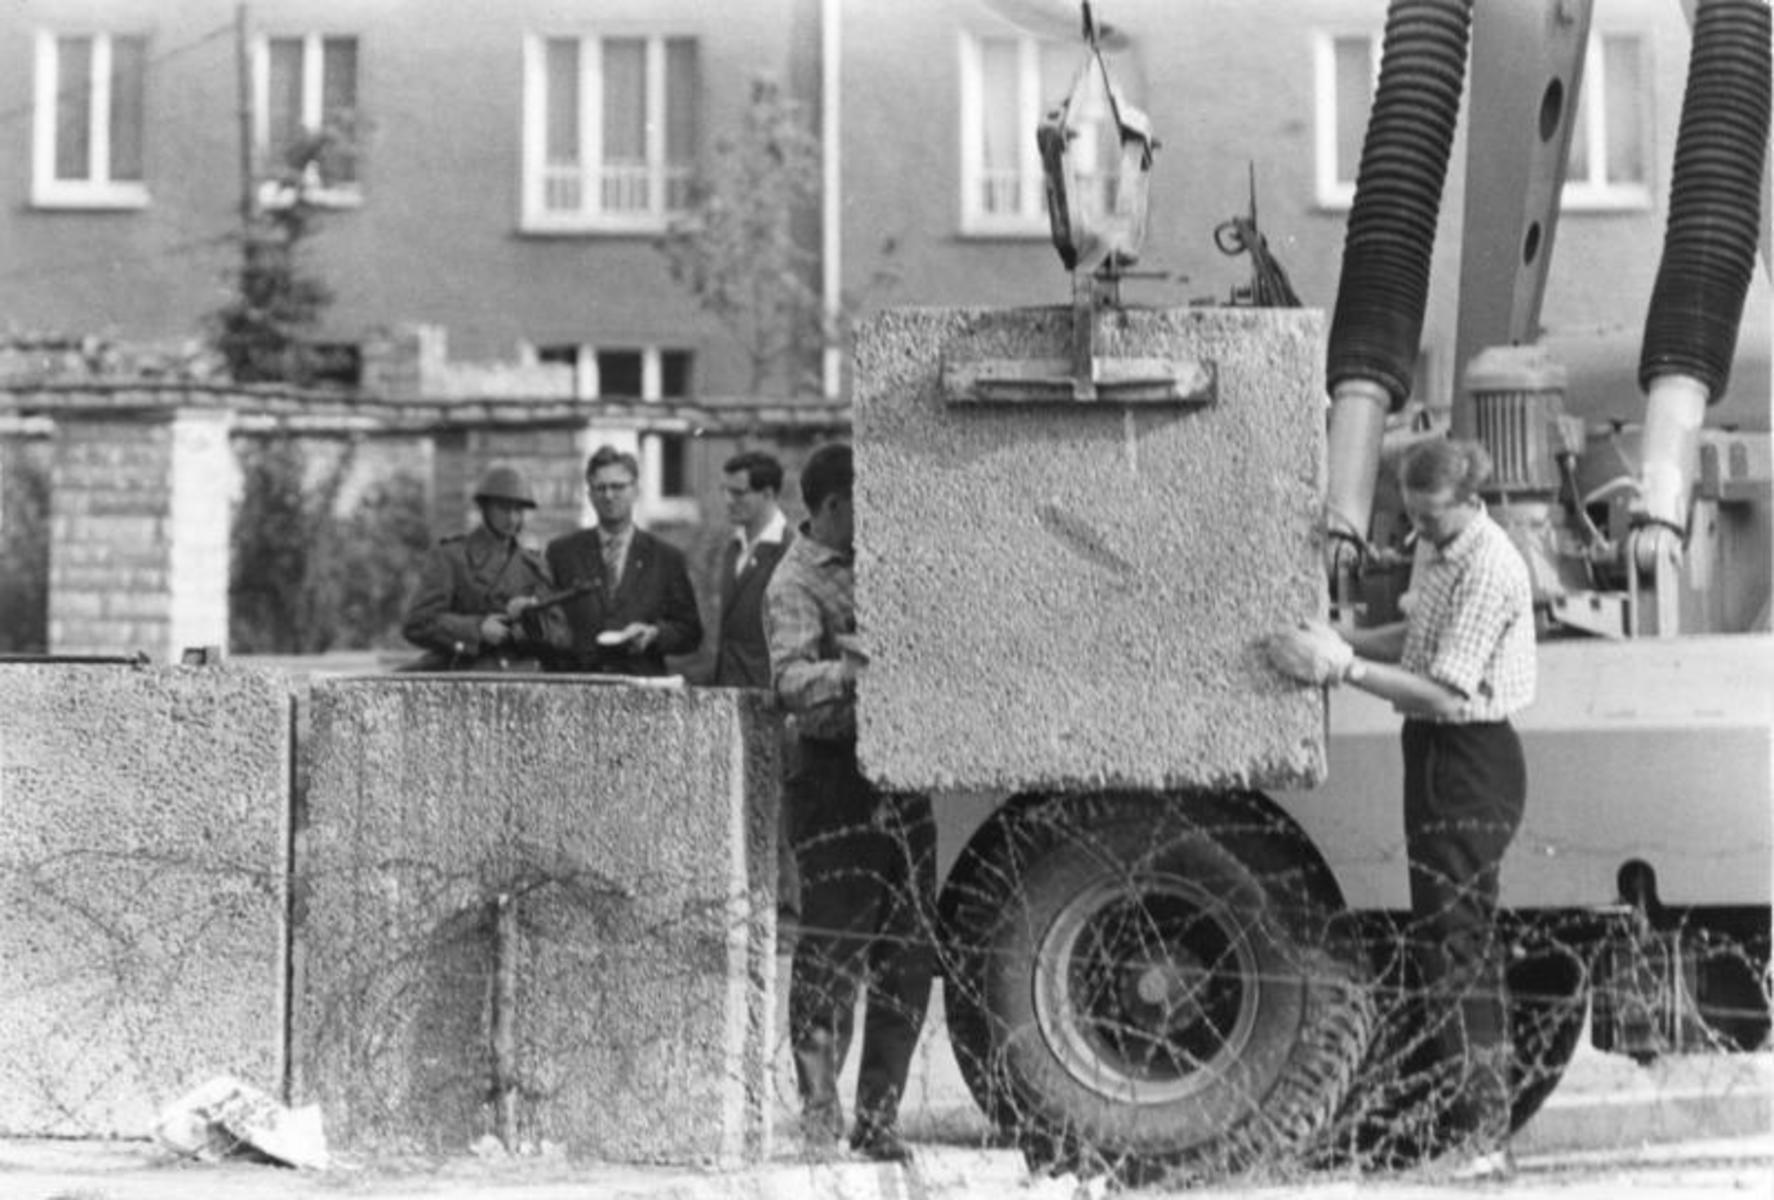 Bundesarchiv_Bild_173-1321,_Berlin,_Mauerbau.jpg